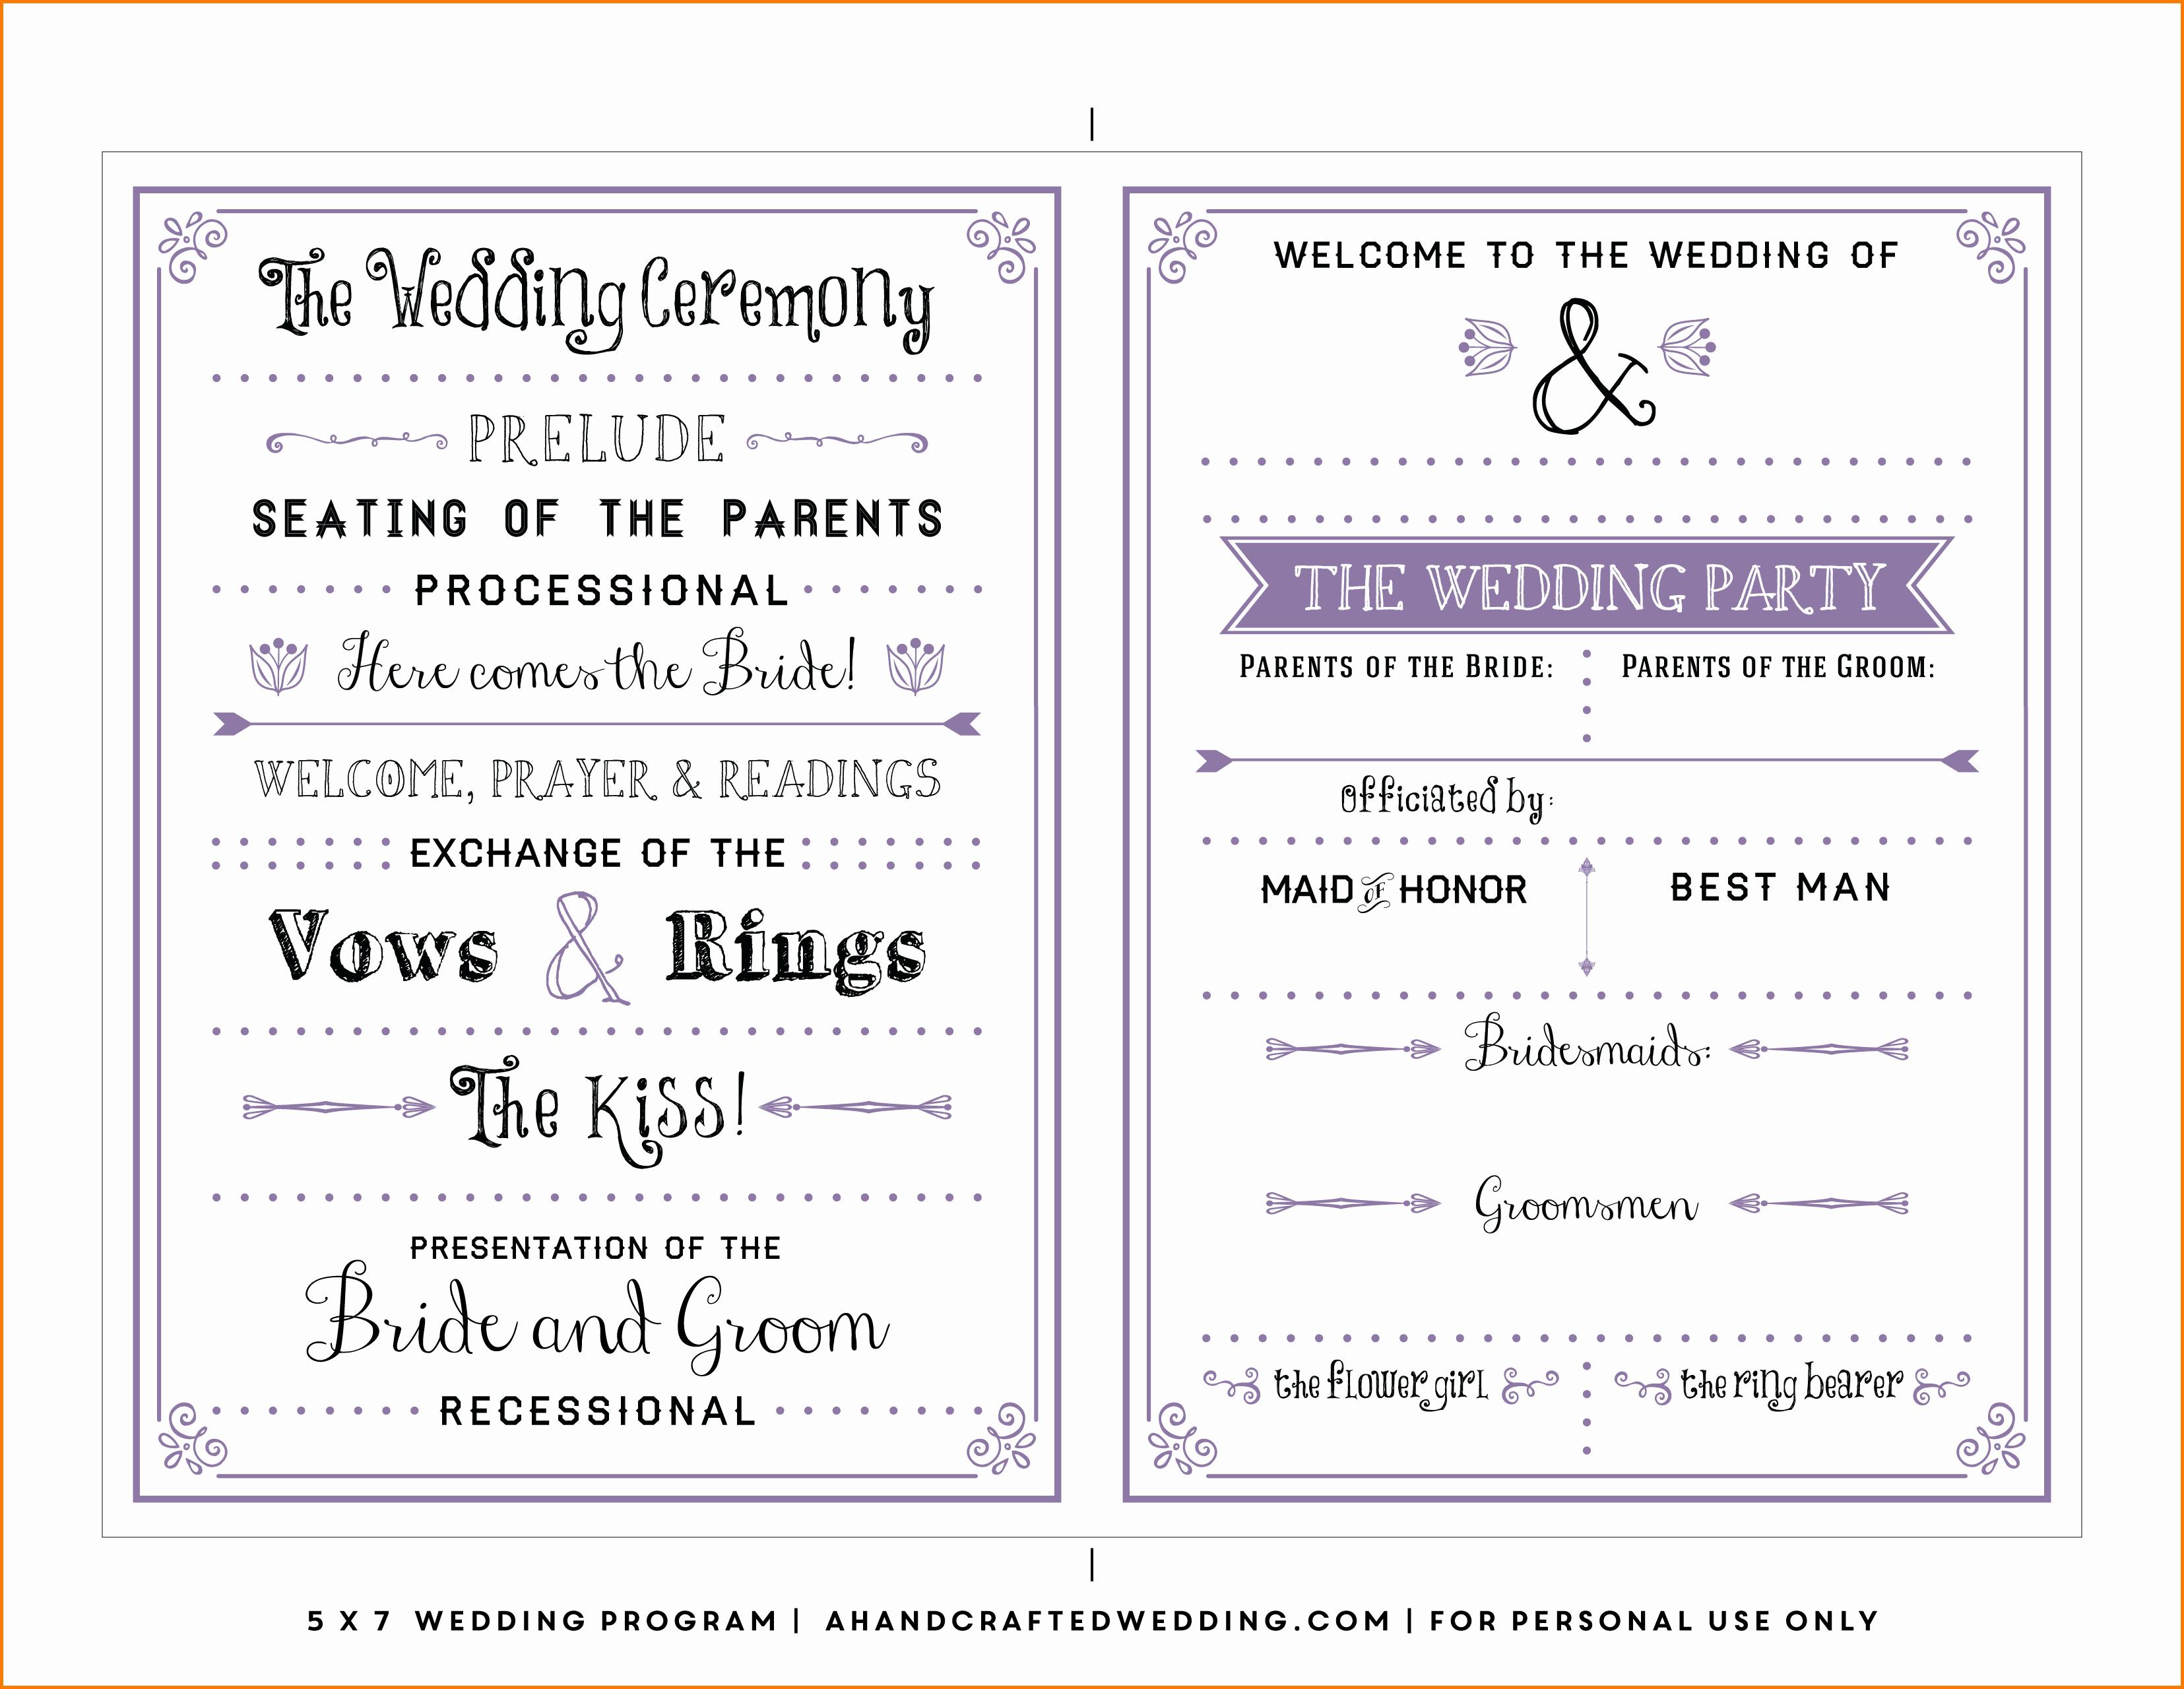 Wedding Programs Templates Free Download Best Of Free Wedding Program Templates